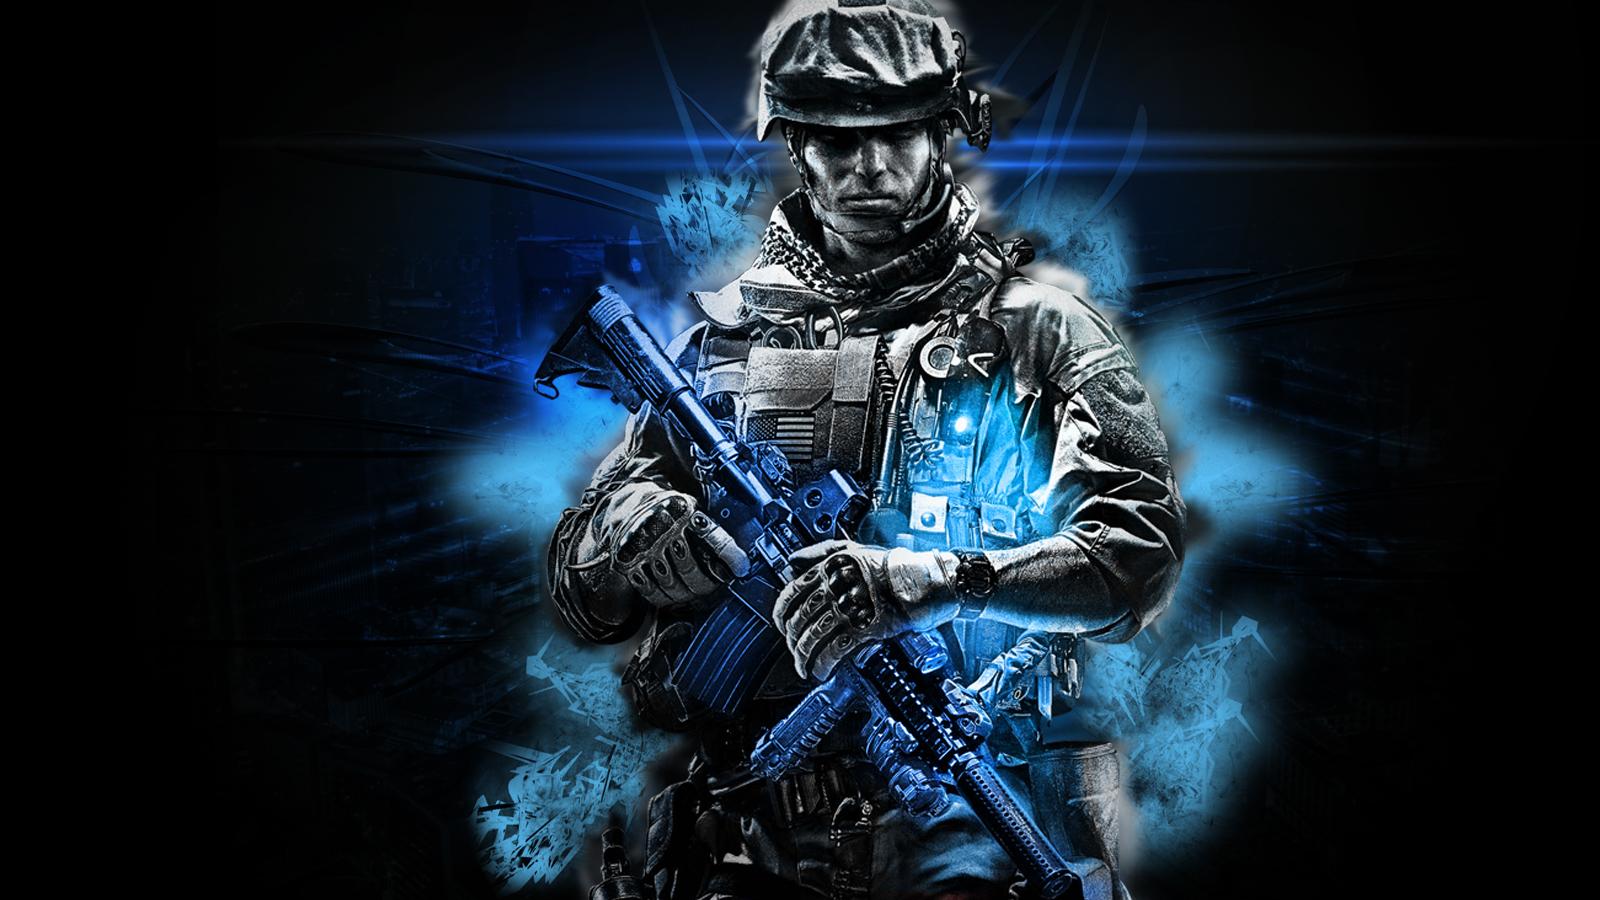 Battlefield 3 Wallpaper   BattleField 3 Desktop Wallpaper 1600x900